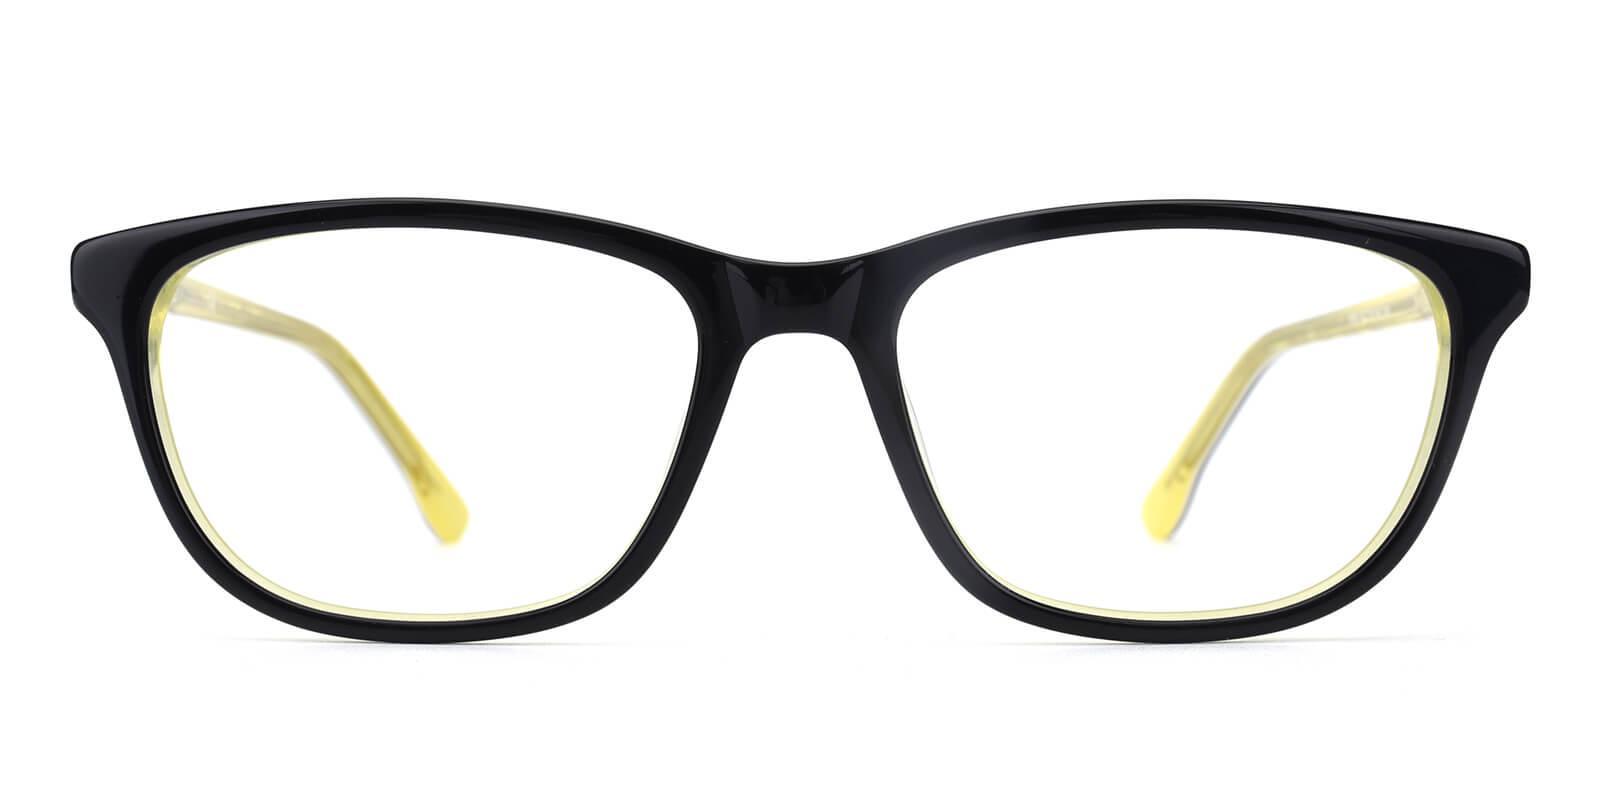 Emblem-Yellow-Square / Cat-Acetate-Eyeglasses-additional2